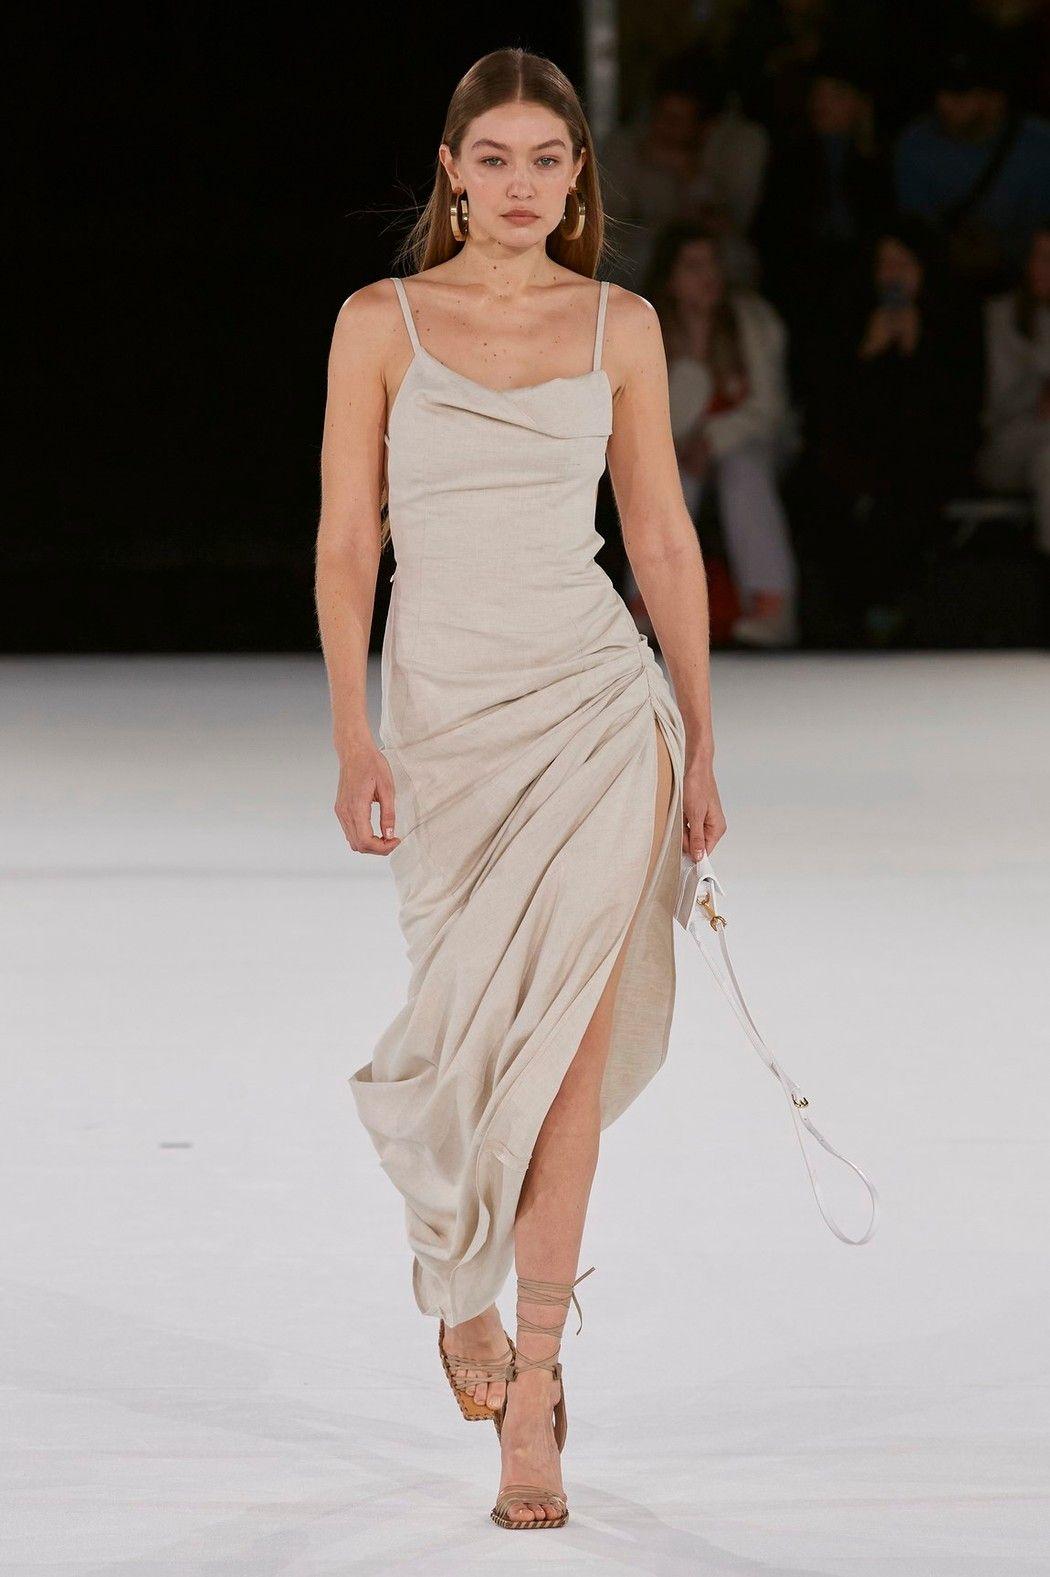 Jacquemus AW20 was an epic fashion spectacular – WhoRunTheWorld♀️